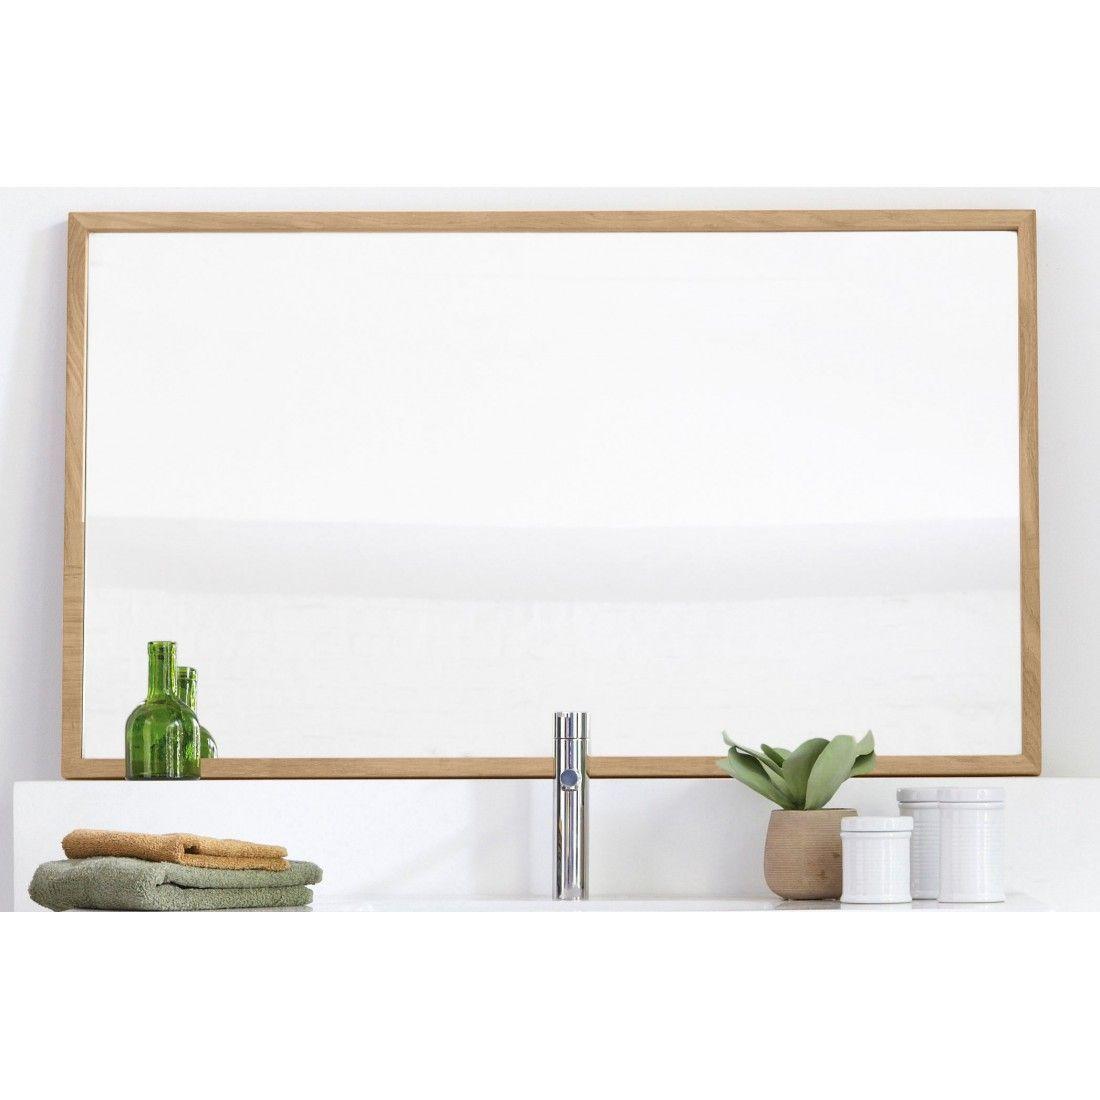 Miroir en teck massif avec des bords fins, Line Art